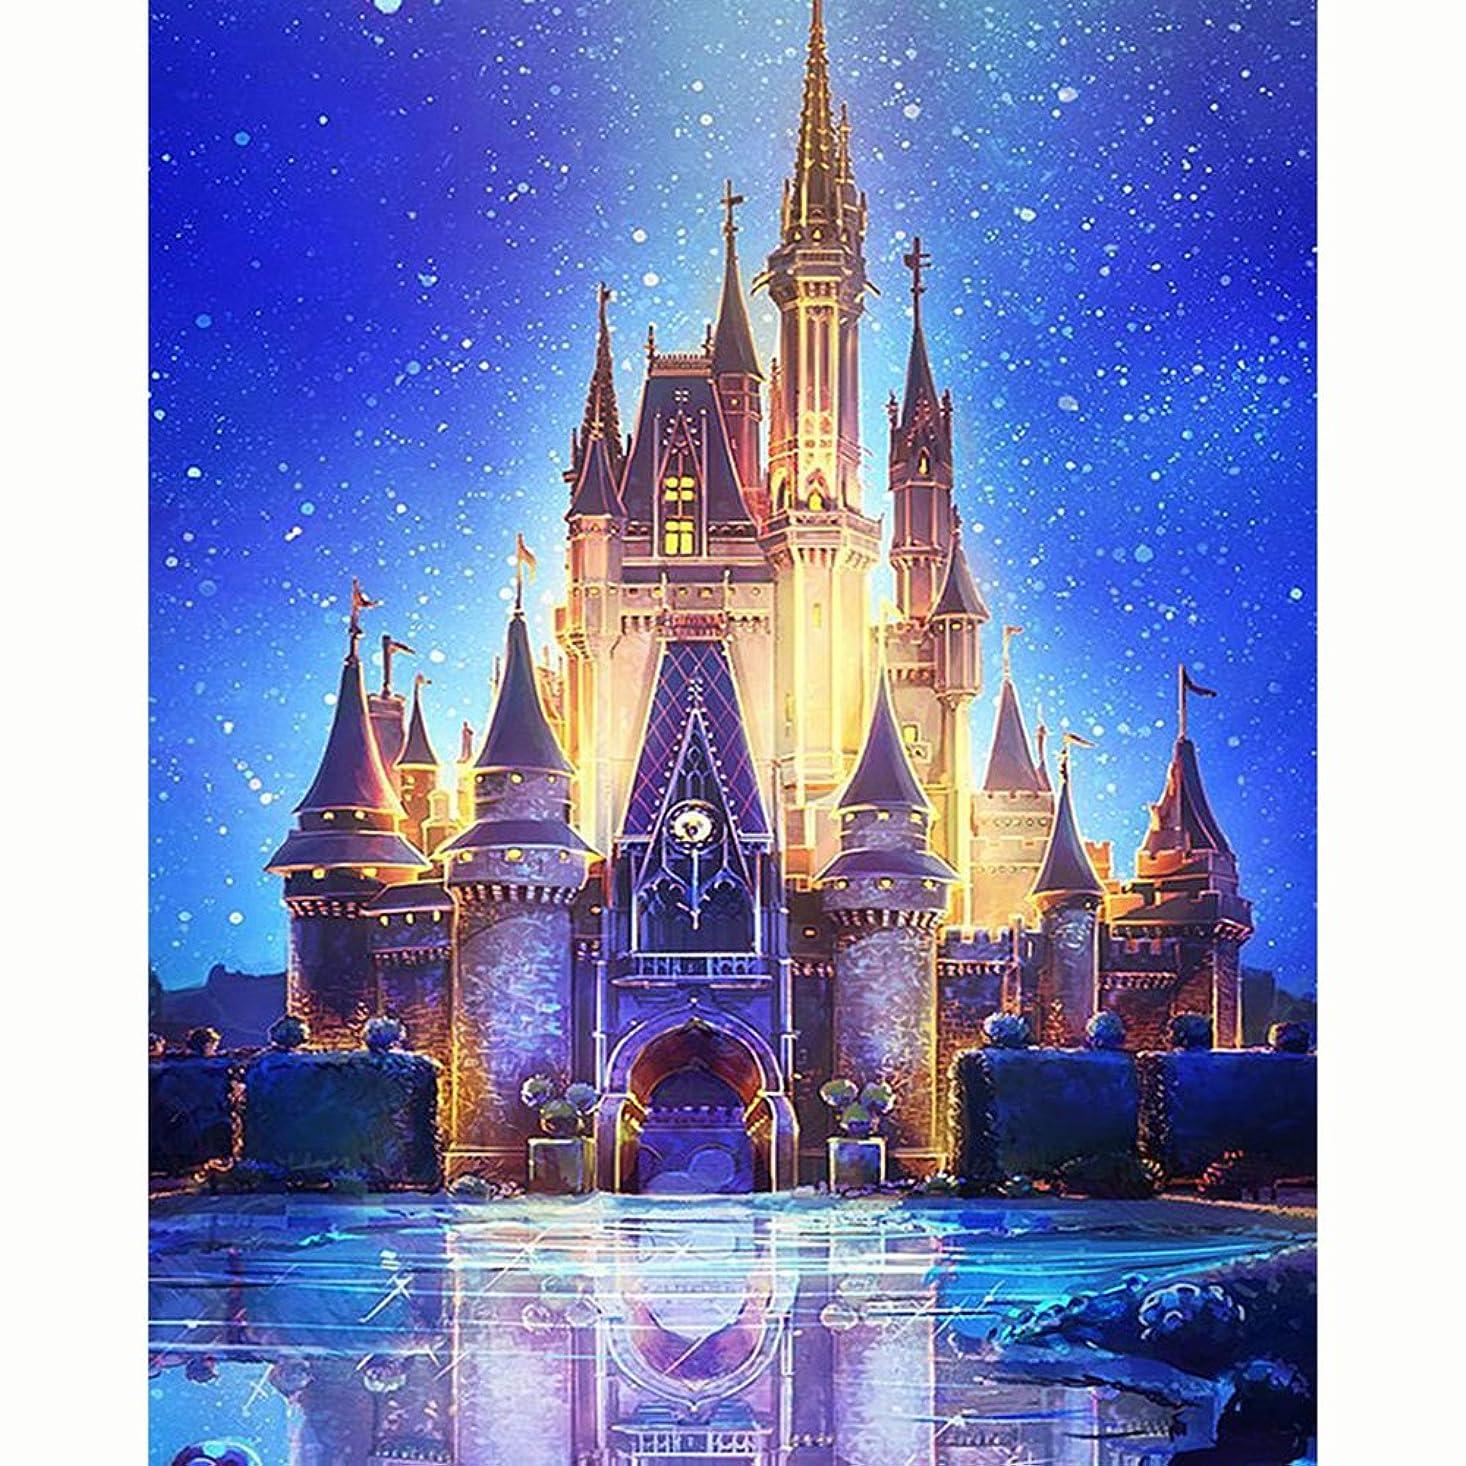 HKKYT 5D DIY Diamond Painting kit Resin Rhinestone Embroidery Cross Stitch Full Drill Home Wall Decor Starry Castle (40x50cm) lmfpzmsmryedqj